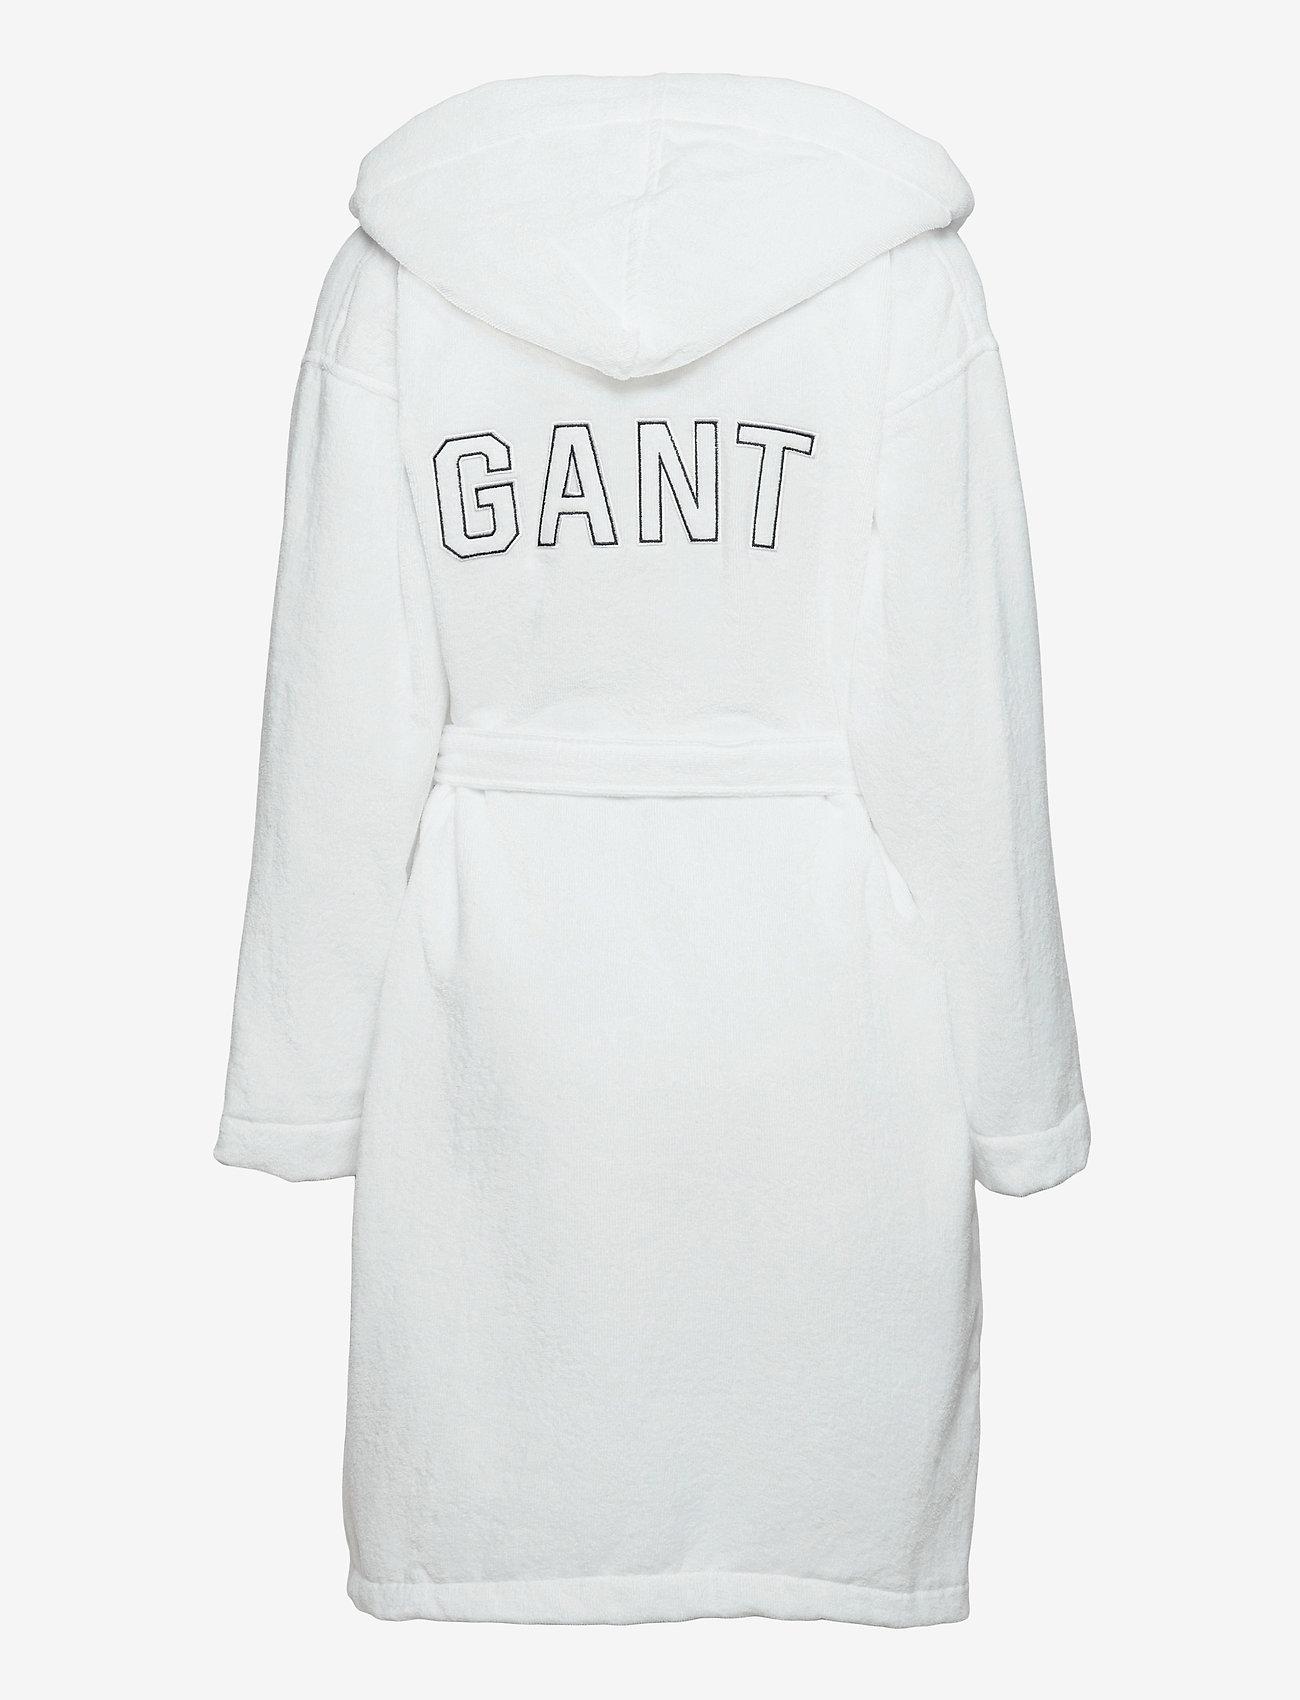 GANT - VACAY ROBE - underwear - white - 1